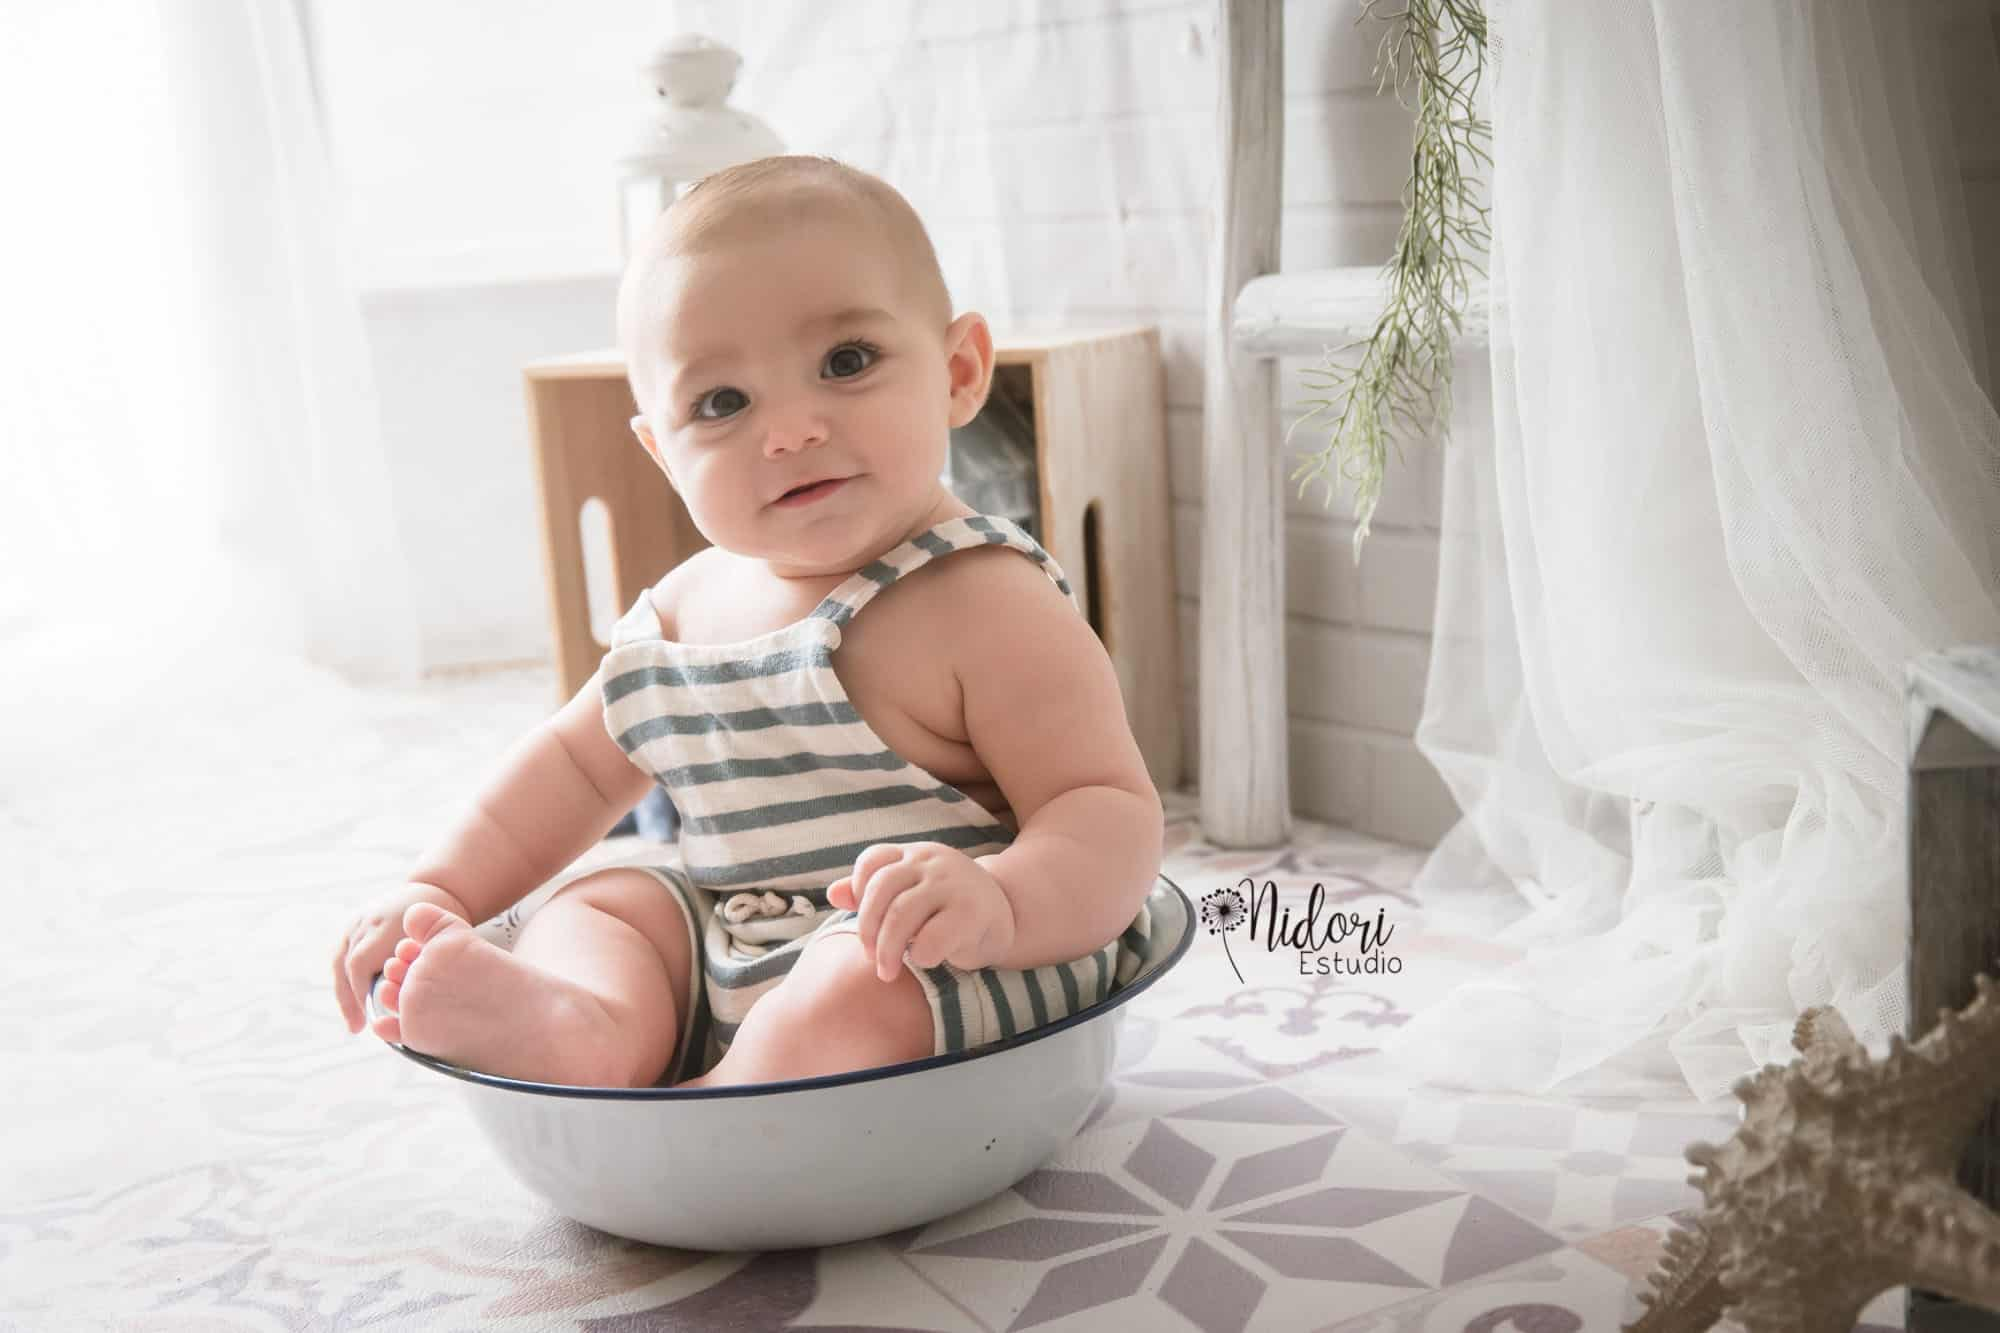 seguimiento-fotografia-niños-bebes-nidoriestudio-fotos-valencia-almazora-castellon-españa-spain-25